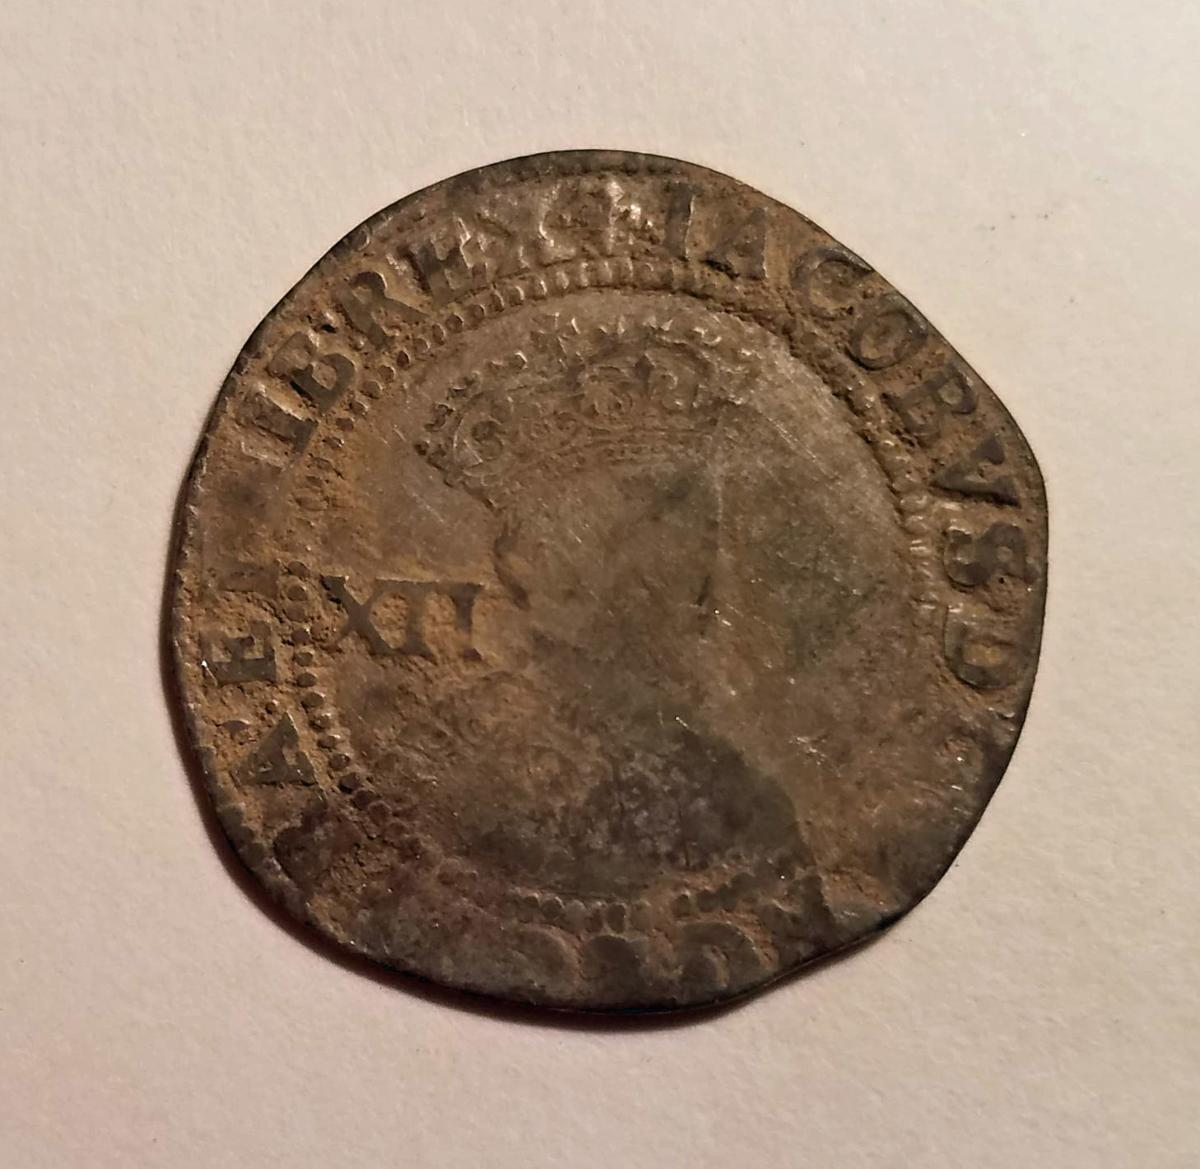 James I Shilling 1604